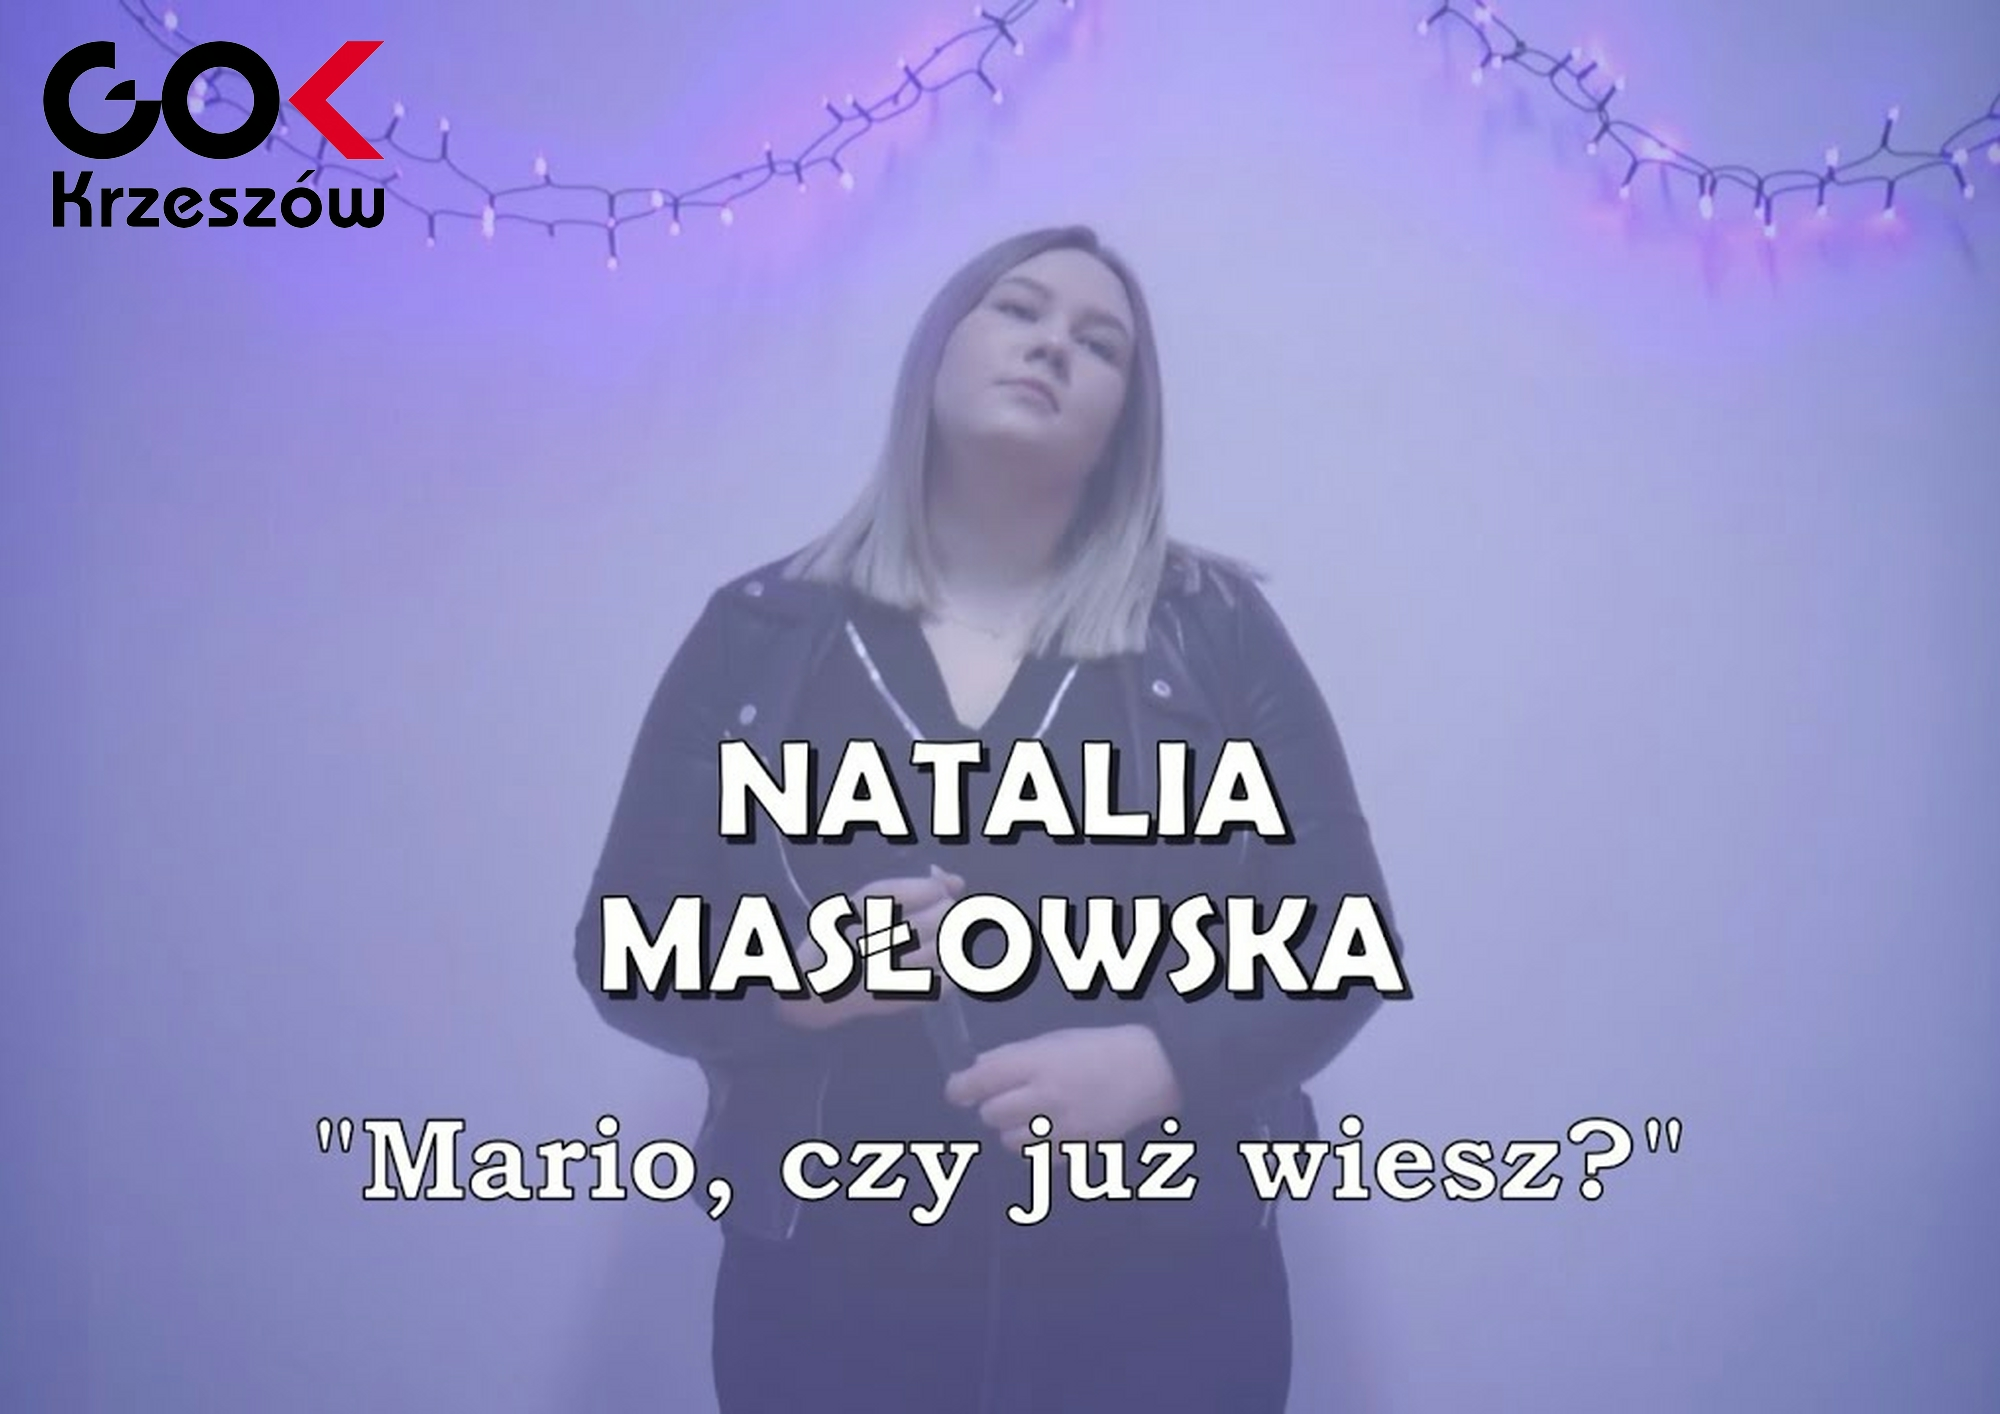 Natalia Masłowska